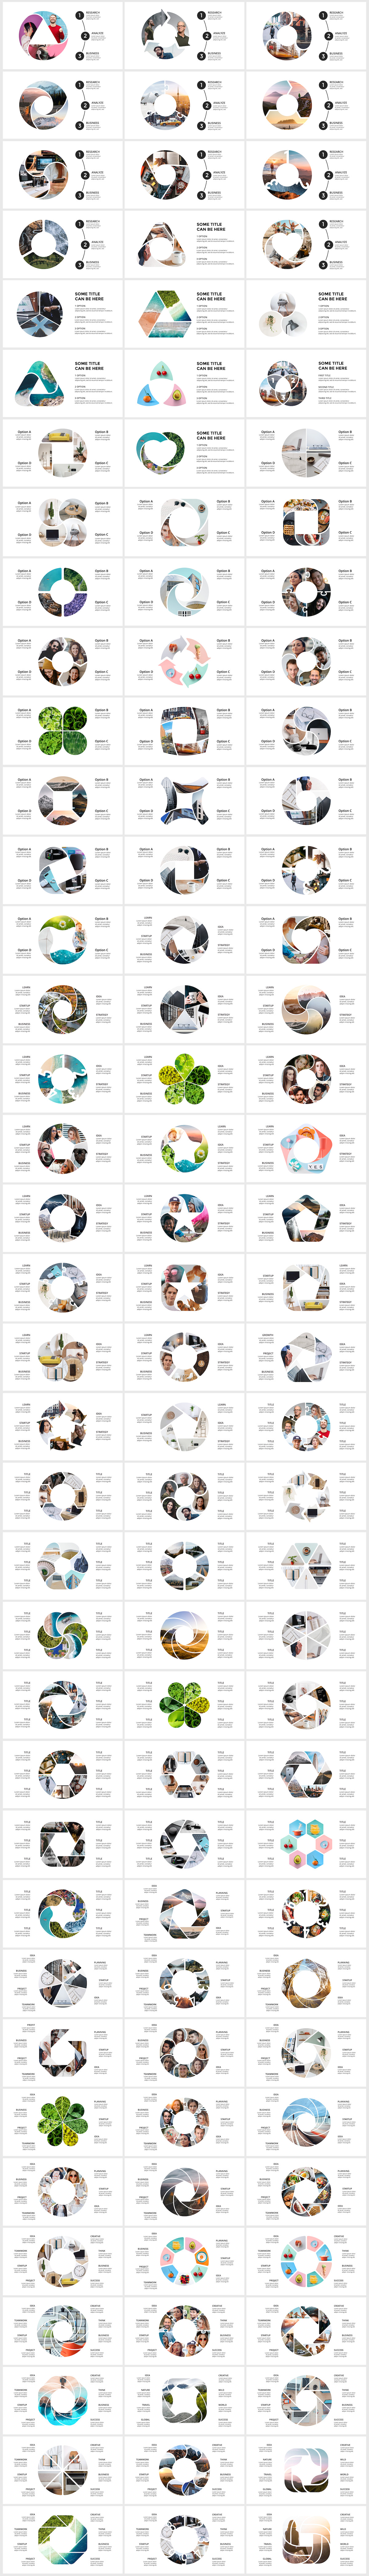 Huge Infographics Bundle! Lifetime Updates! PowerPoint, Photoshop, Illustrator. - 161